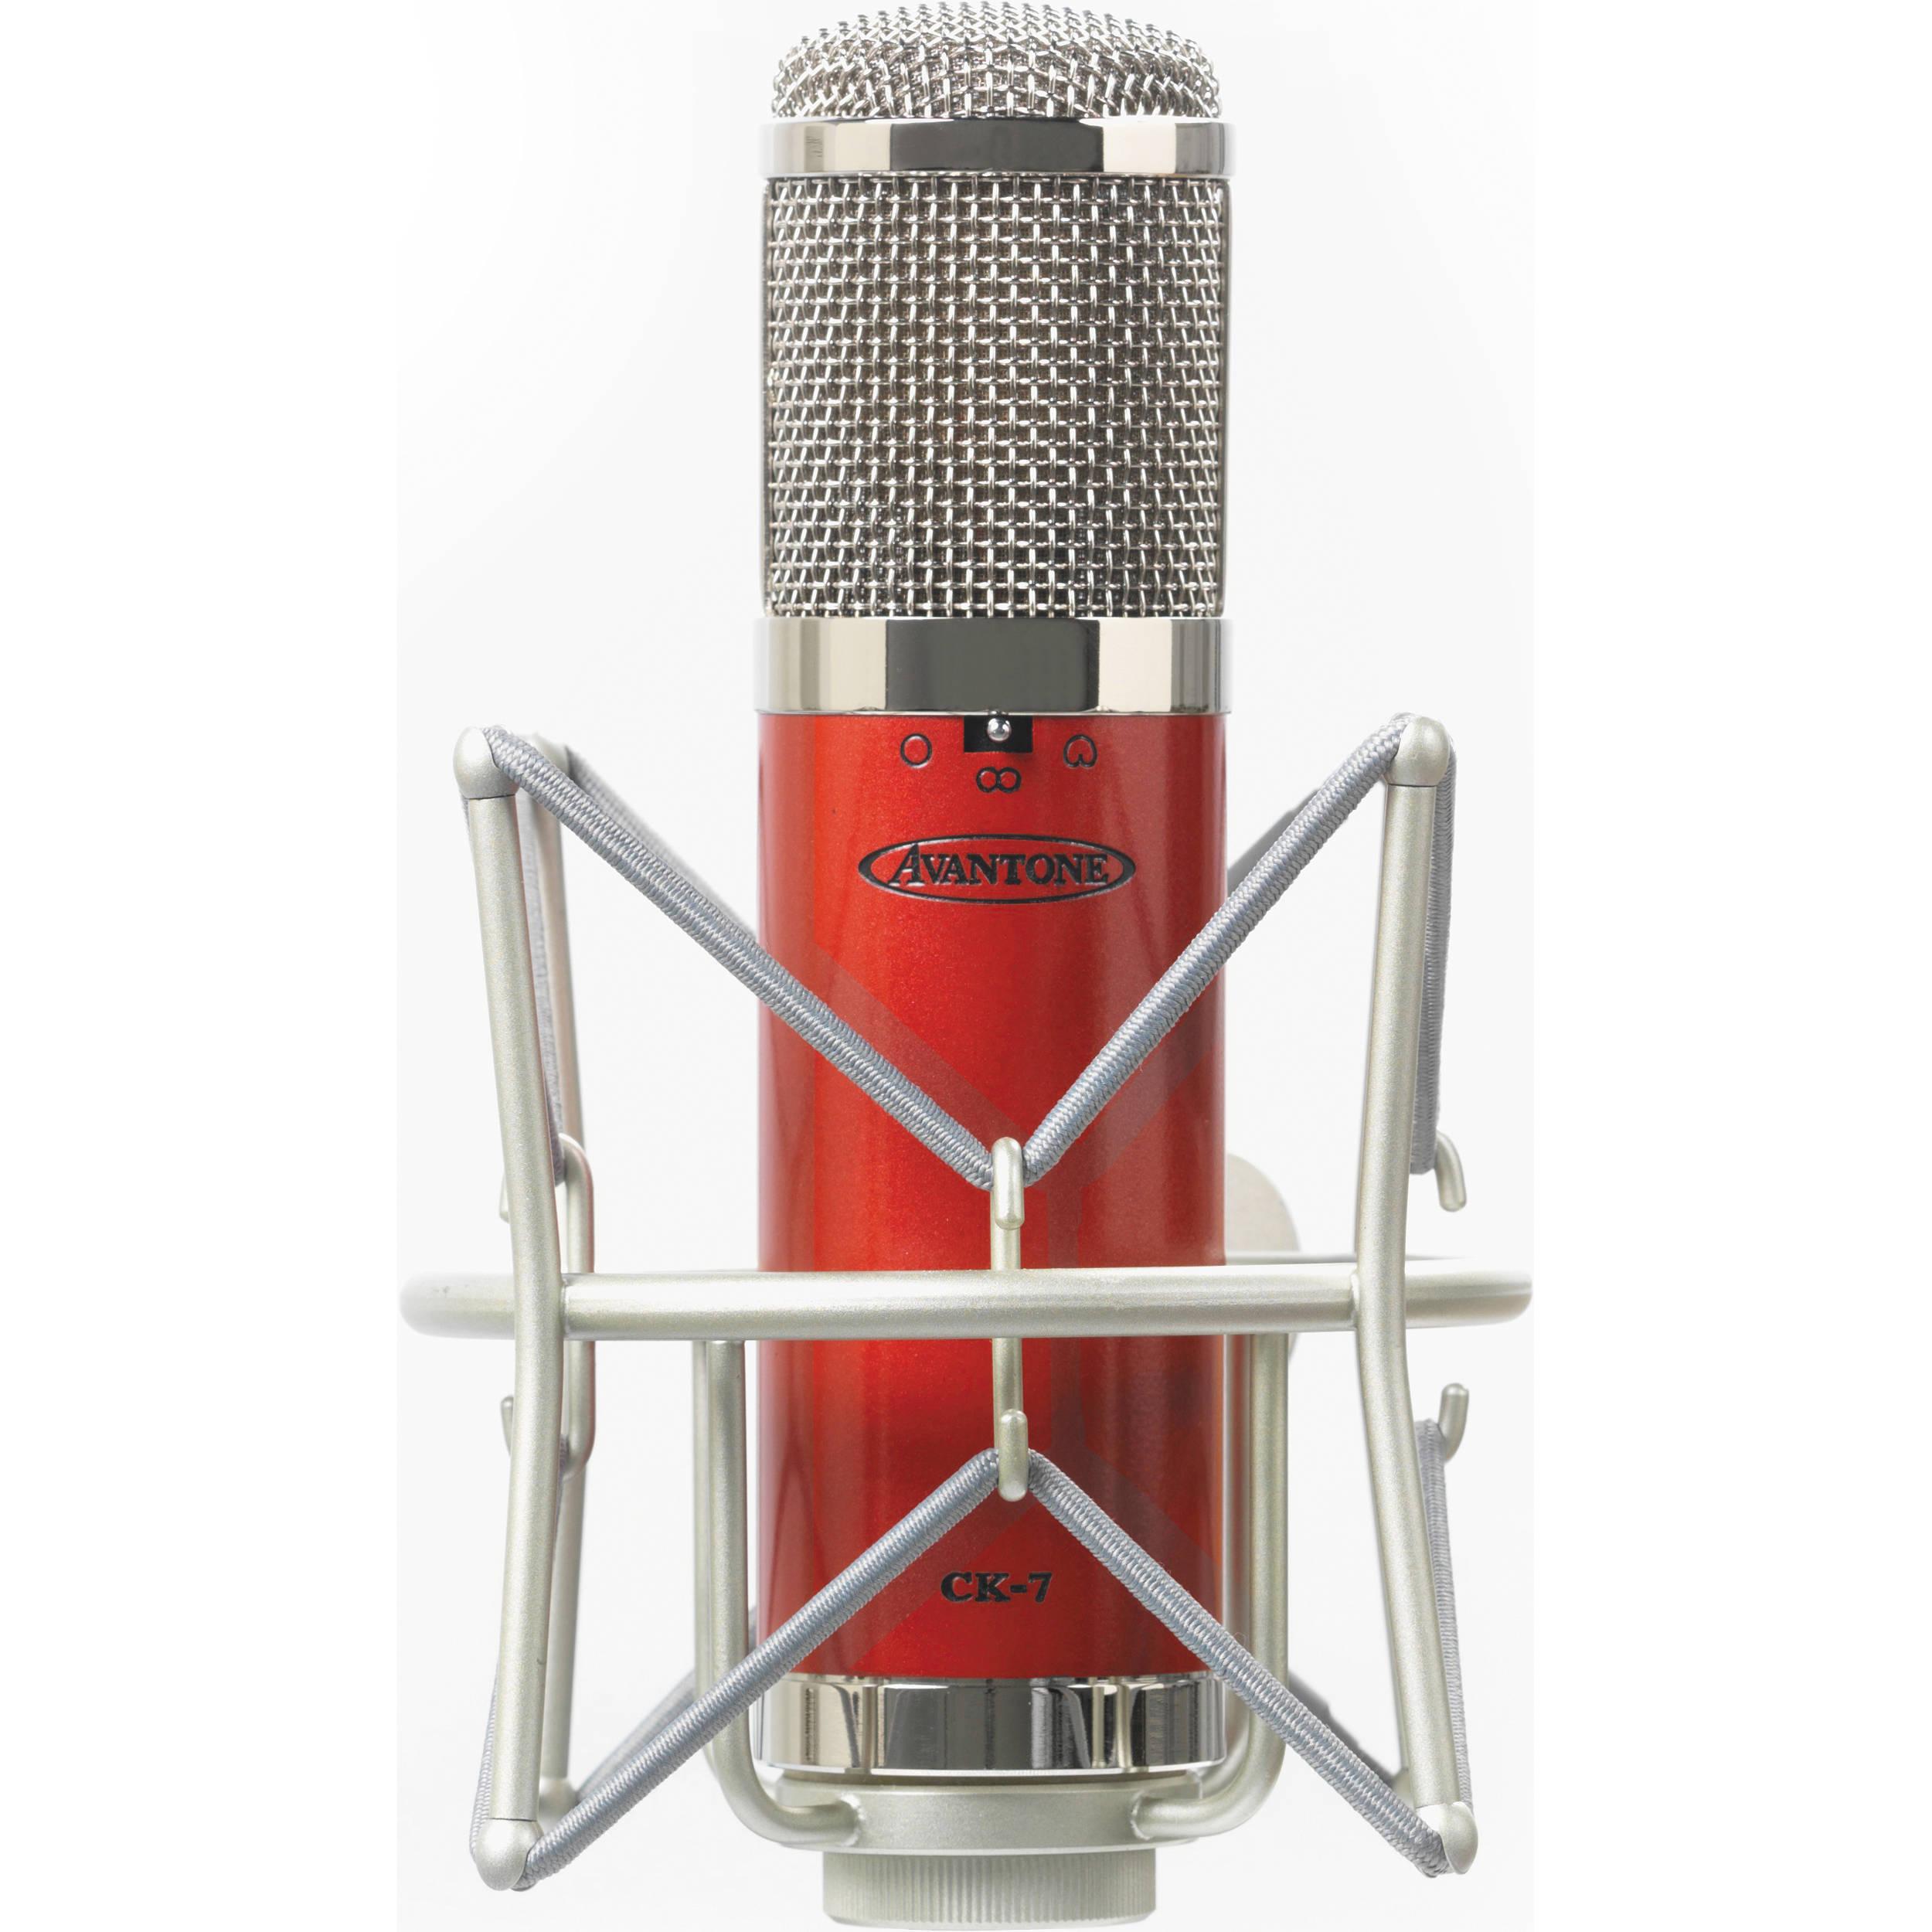 Avantone Pro Ck 7 Large Capsule Multi Pattern Fet Condenser Ck7 Overload Current Trip Microphone